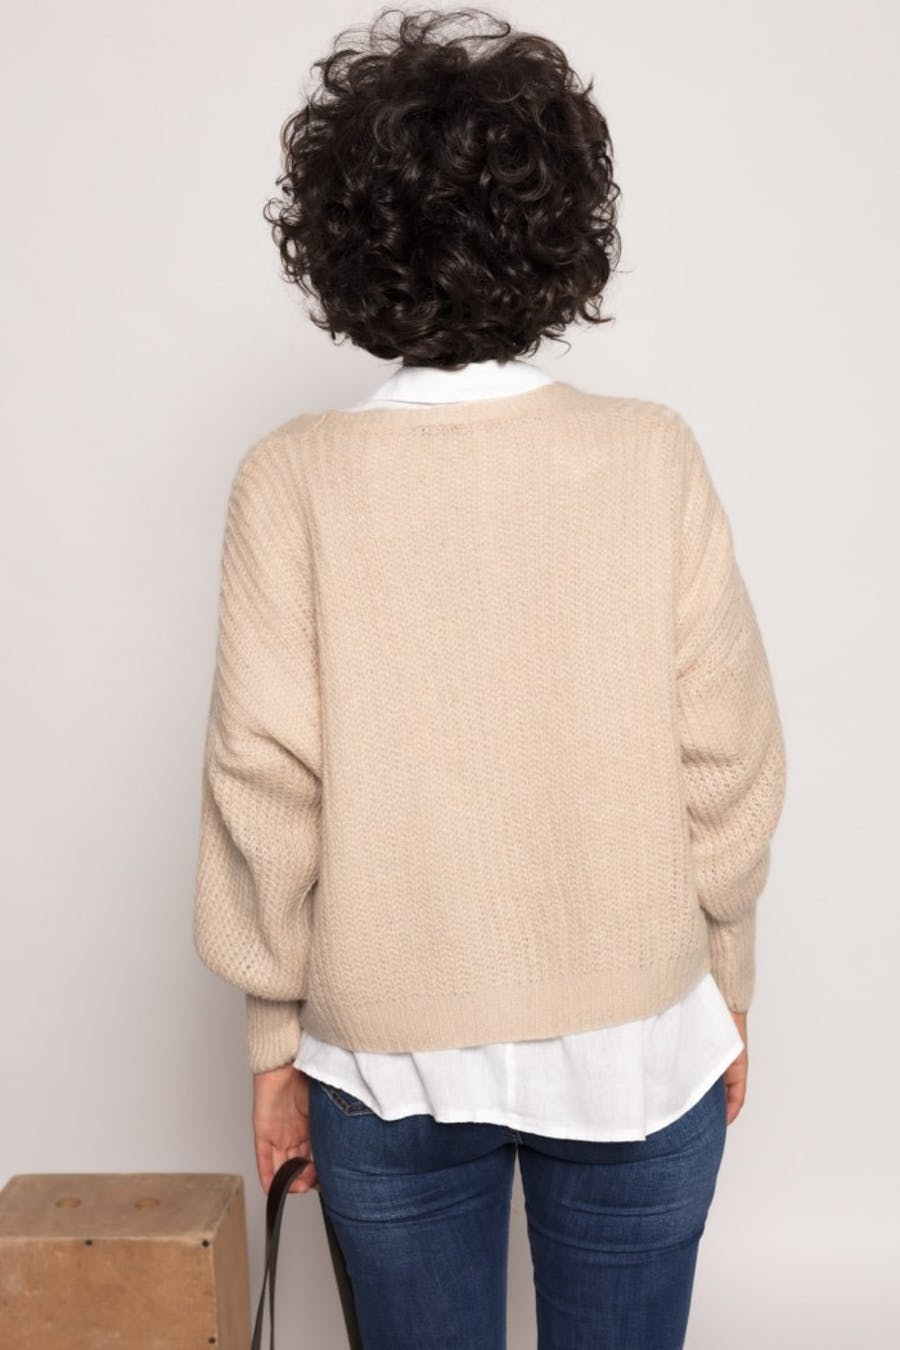 Chaqueta Cassual con lana Beige